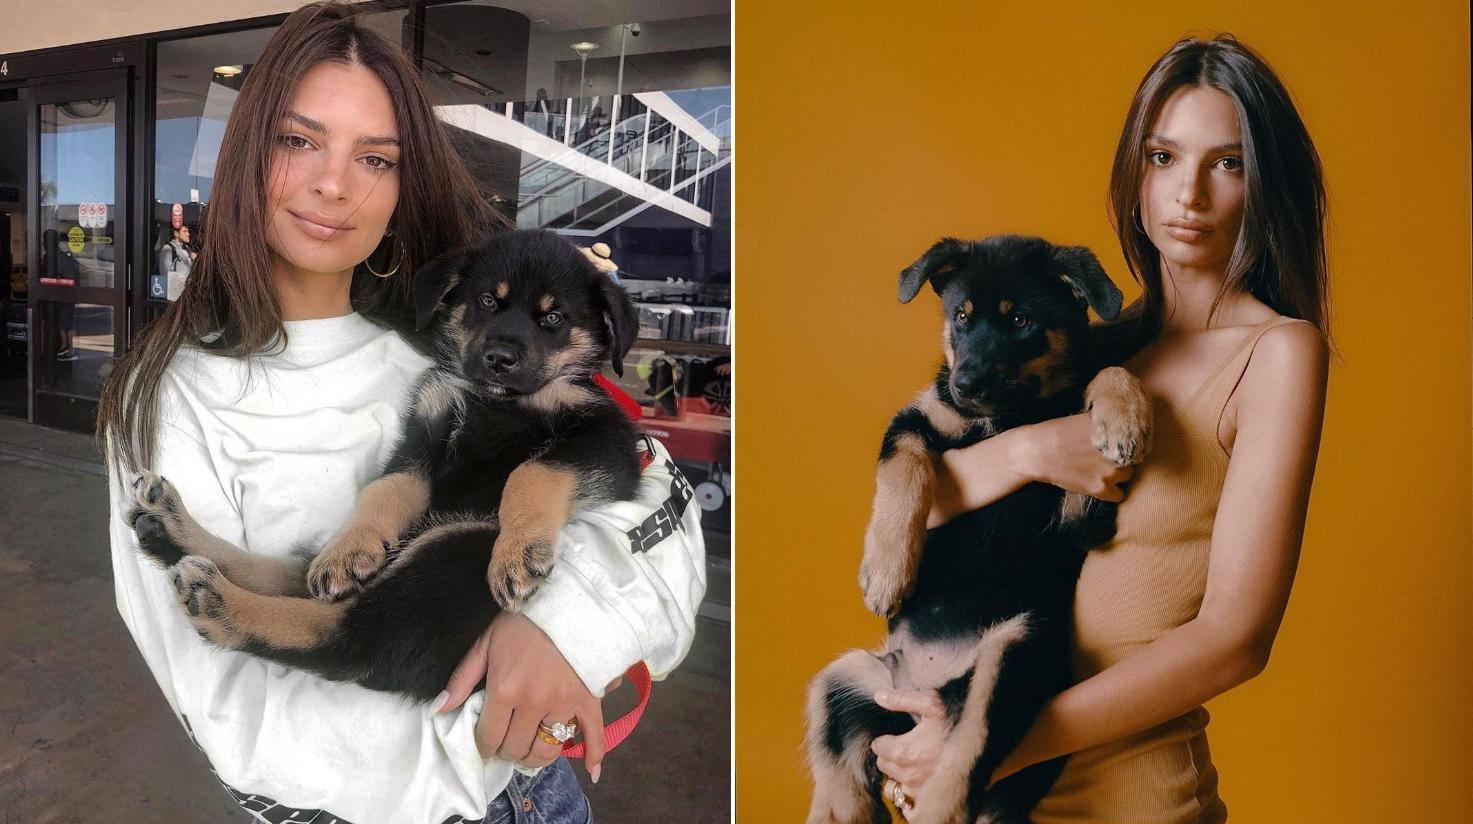 Emily Ratajkowski se obukla i pozirala s psićem Colombom